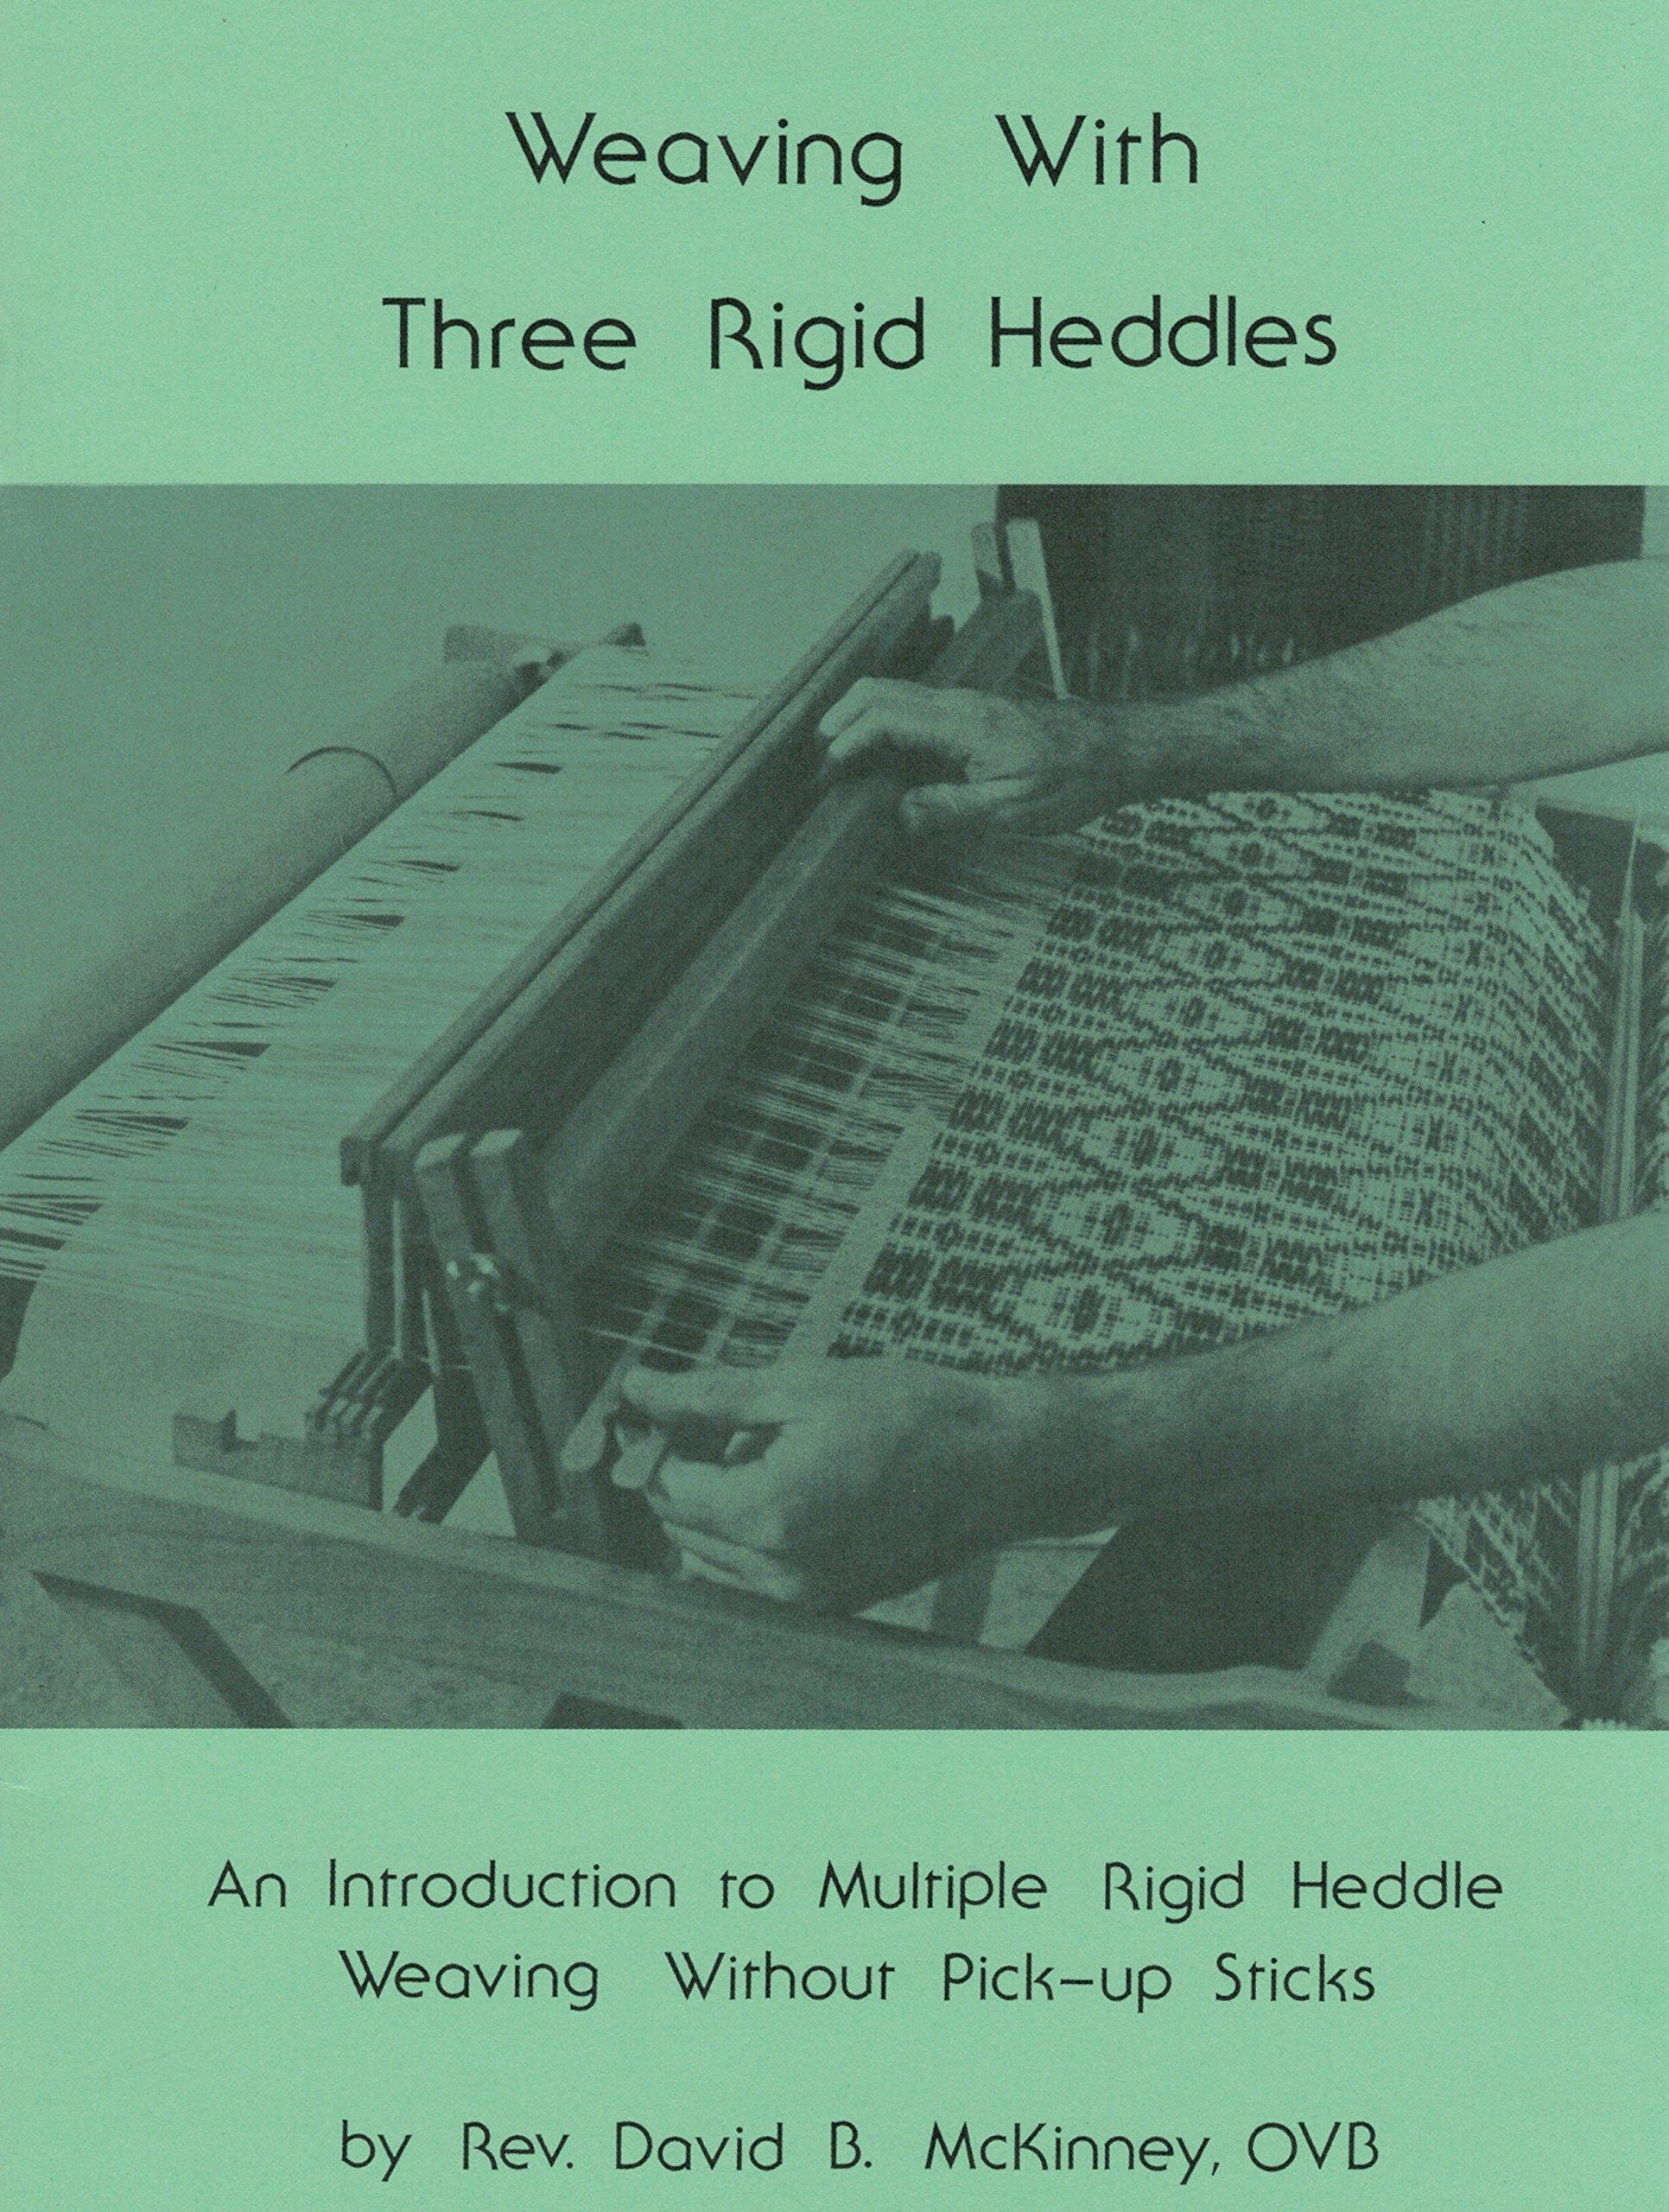 Weaving with three rigid heddles: An introduction to multiple rigid heddle weaving without pick-up sticks